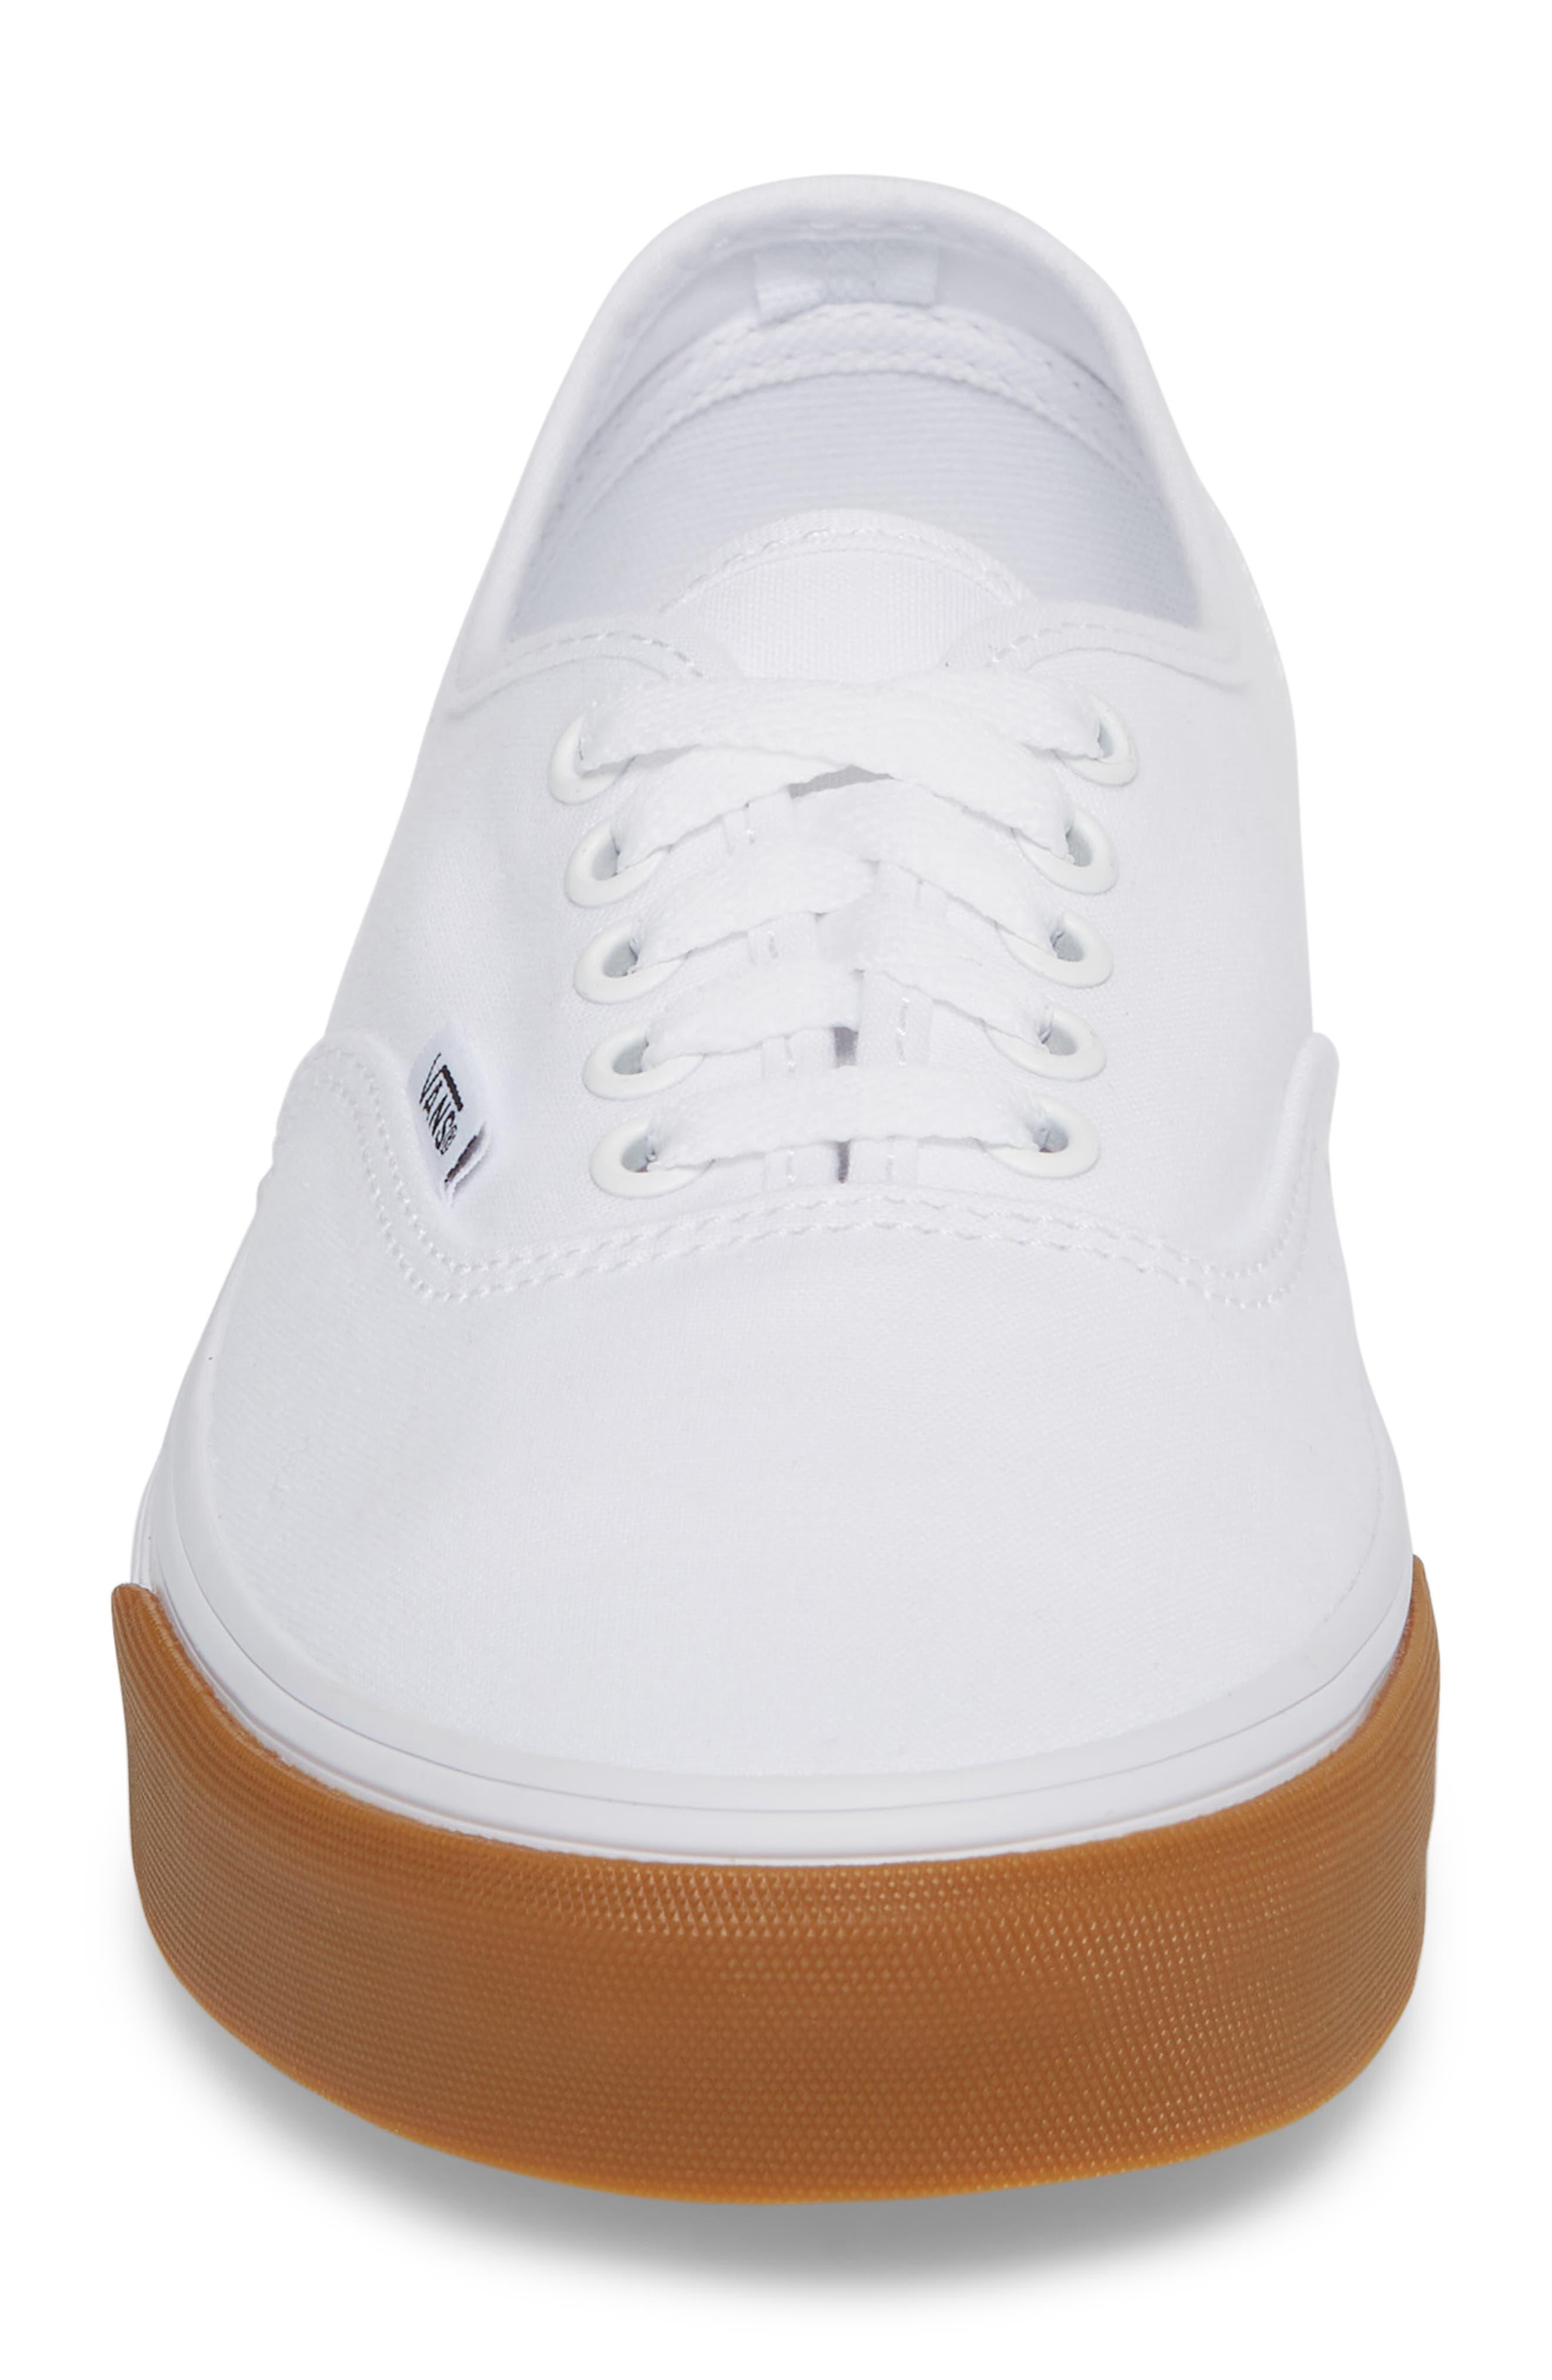 Authentic Gum Bumper Sneaker,                             Alternate thumbnail 4, color,                             True White/ True White